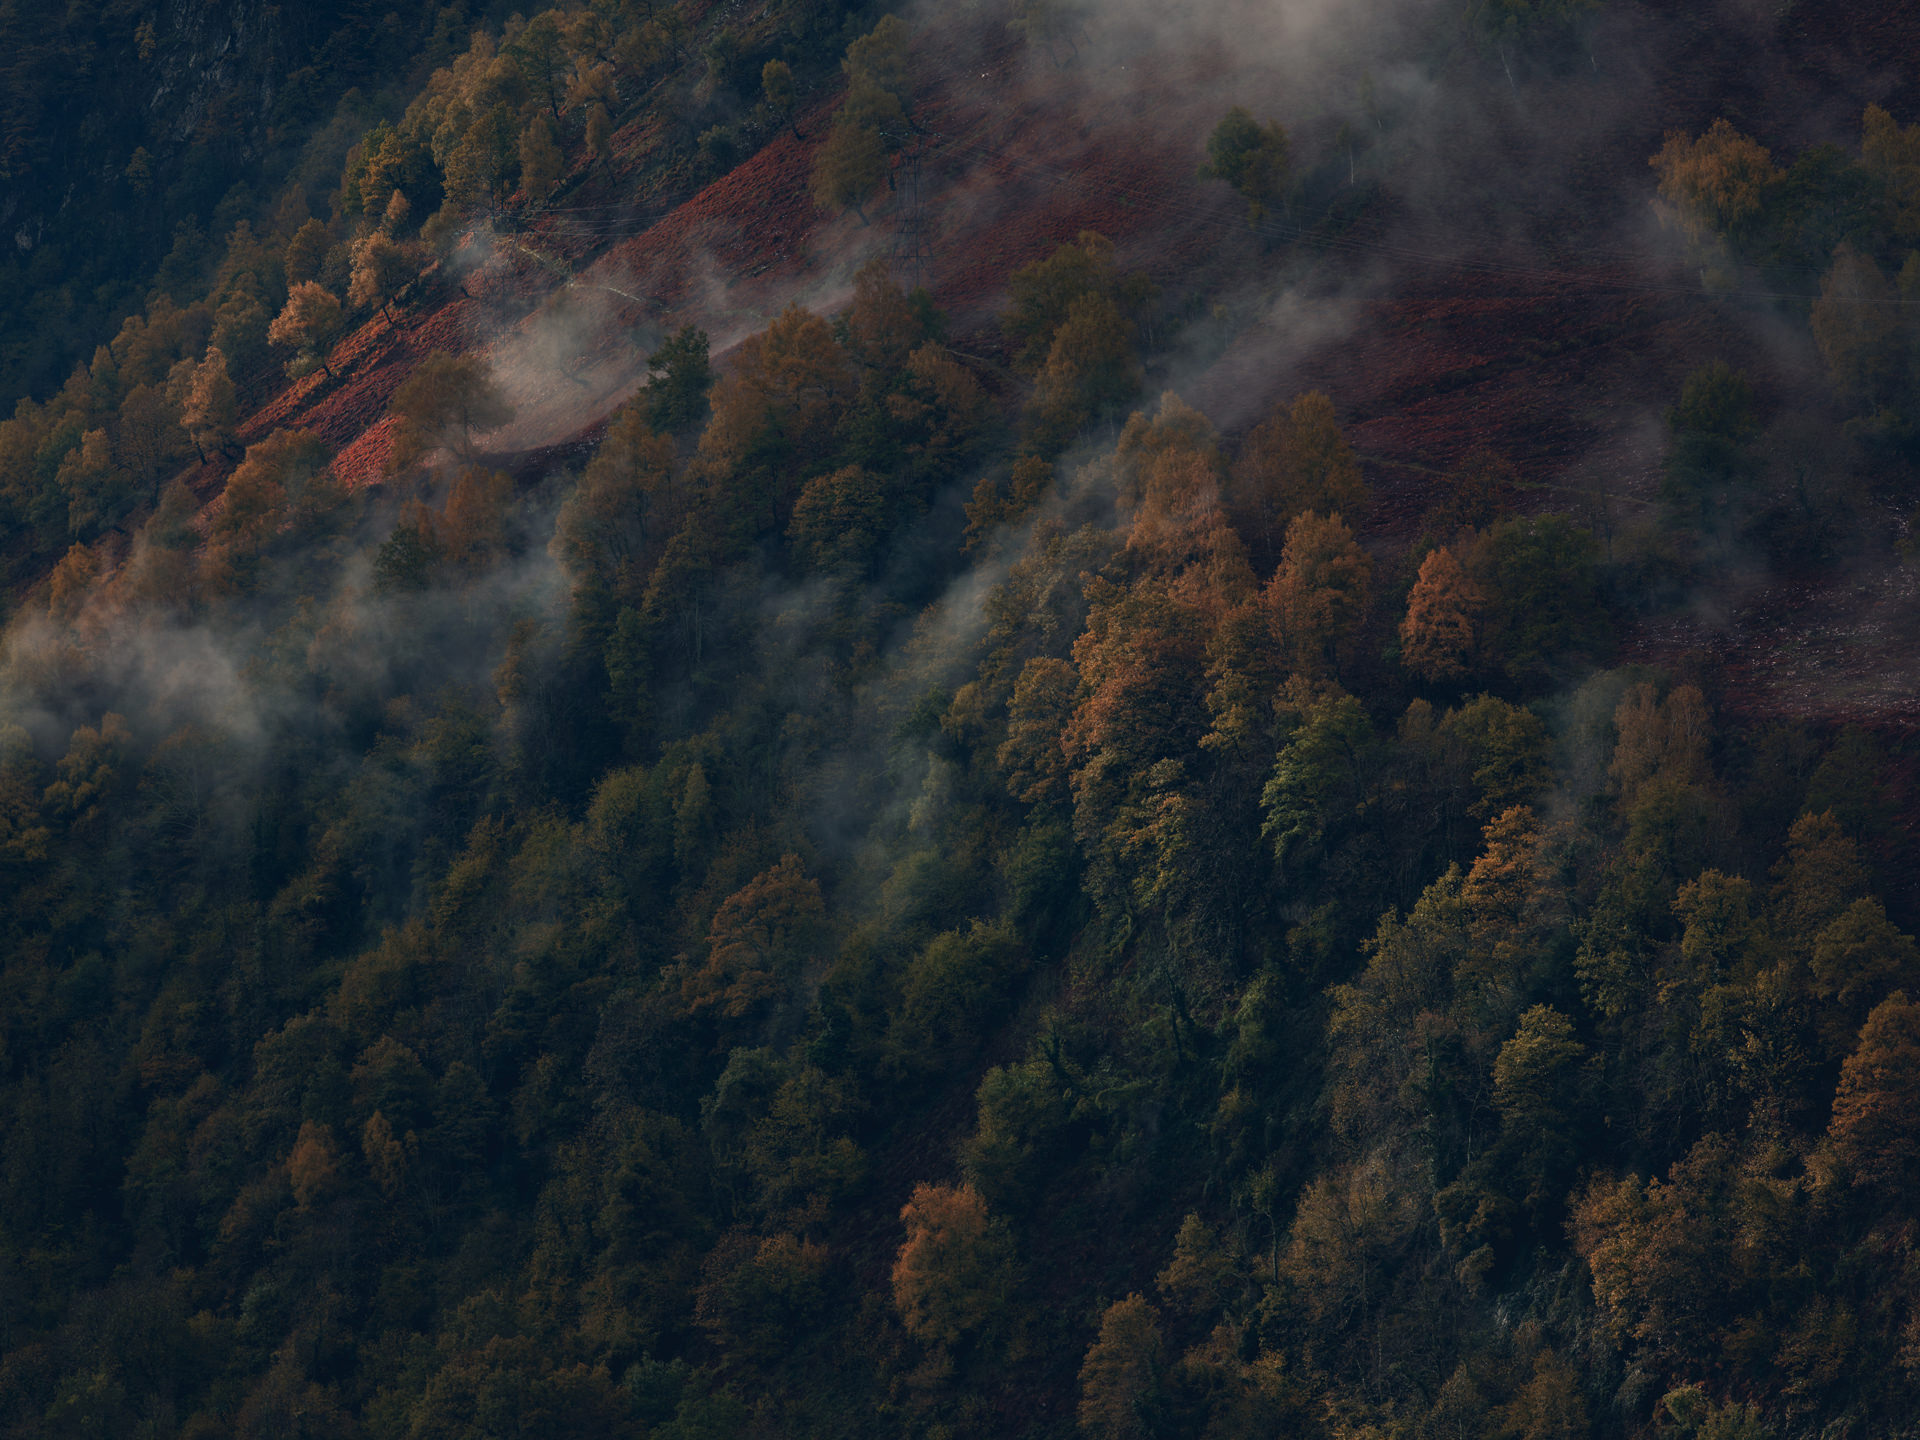 pyrenees, landscape, france, spain, anke luckmann, mountains, www.ankeluckmann.com, trees